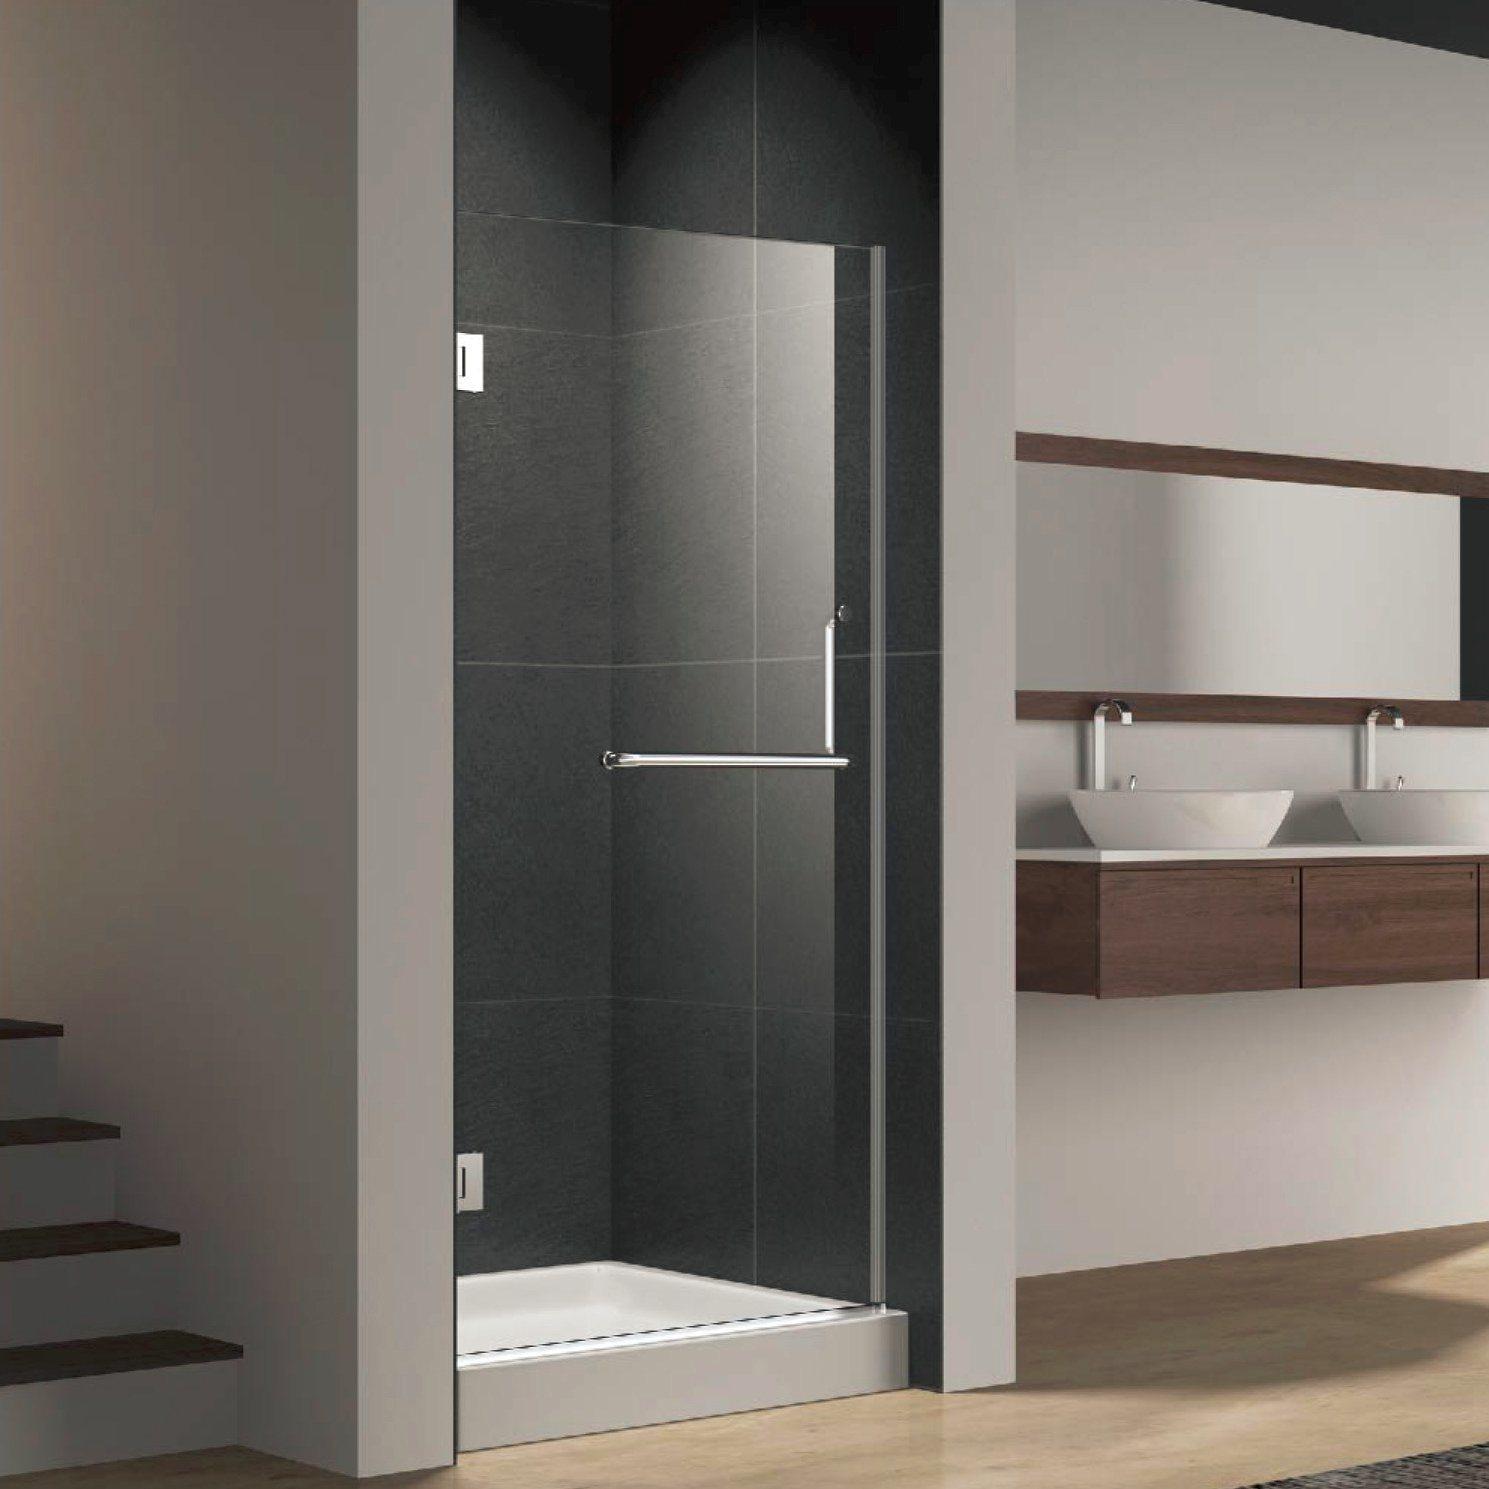 China Frameless Hinge Shower Door Screen With Stainless Steel Towel Bar China Shower Door Shower Enclosure